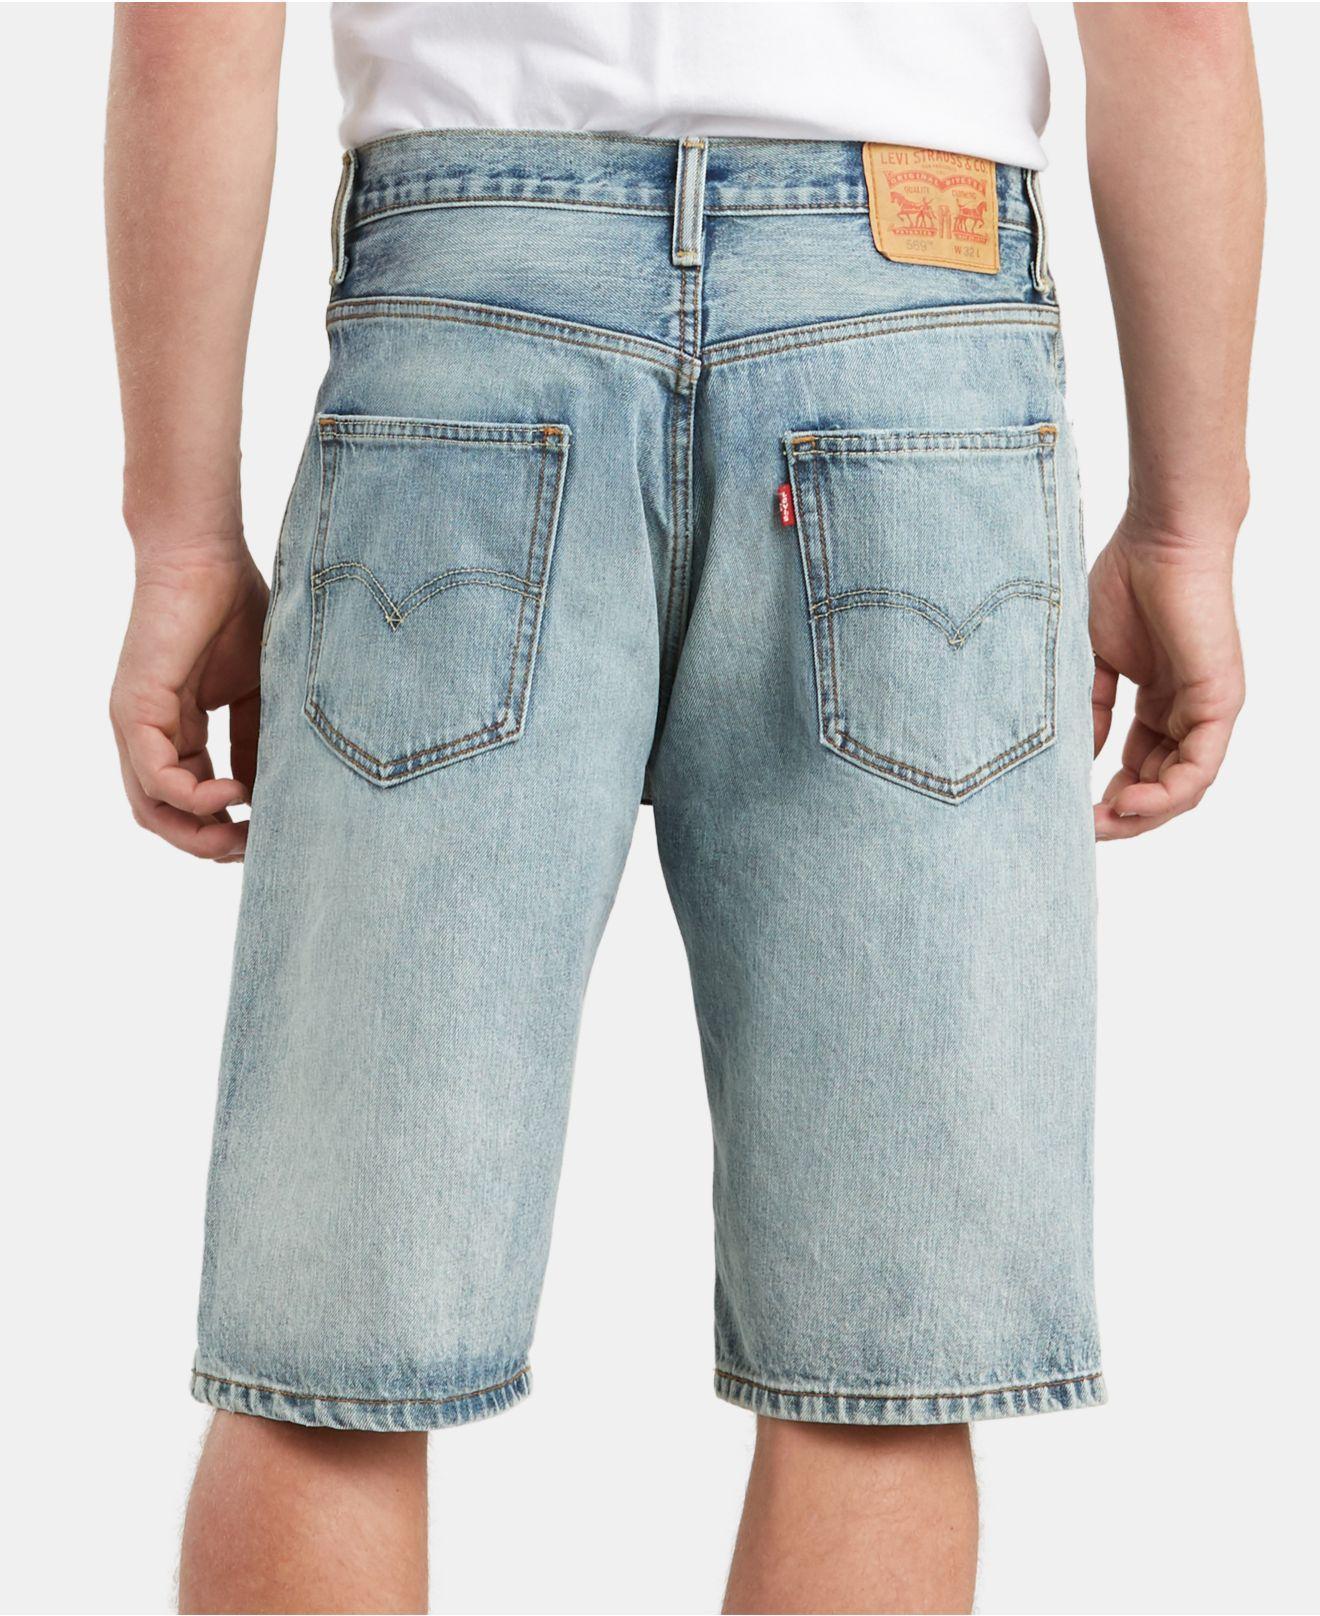 dd276dfe Lyst - Levi's Big & Tall 569tm Loose Fit Denim Shorts in Blue for Men